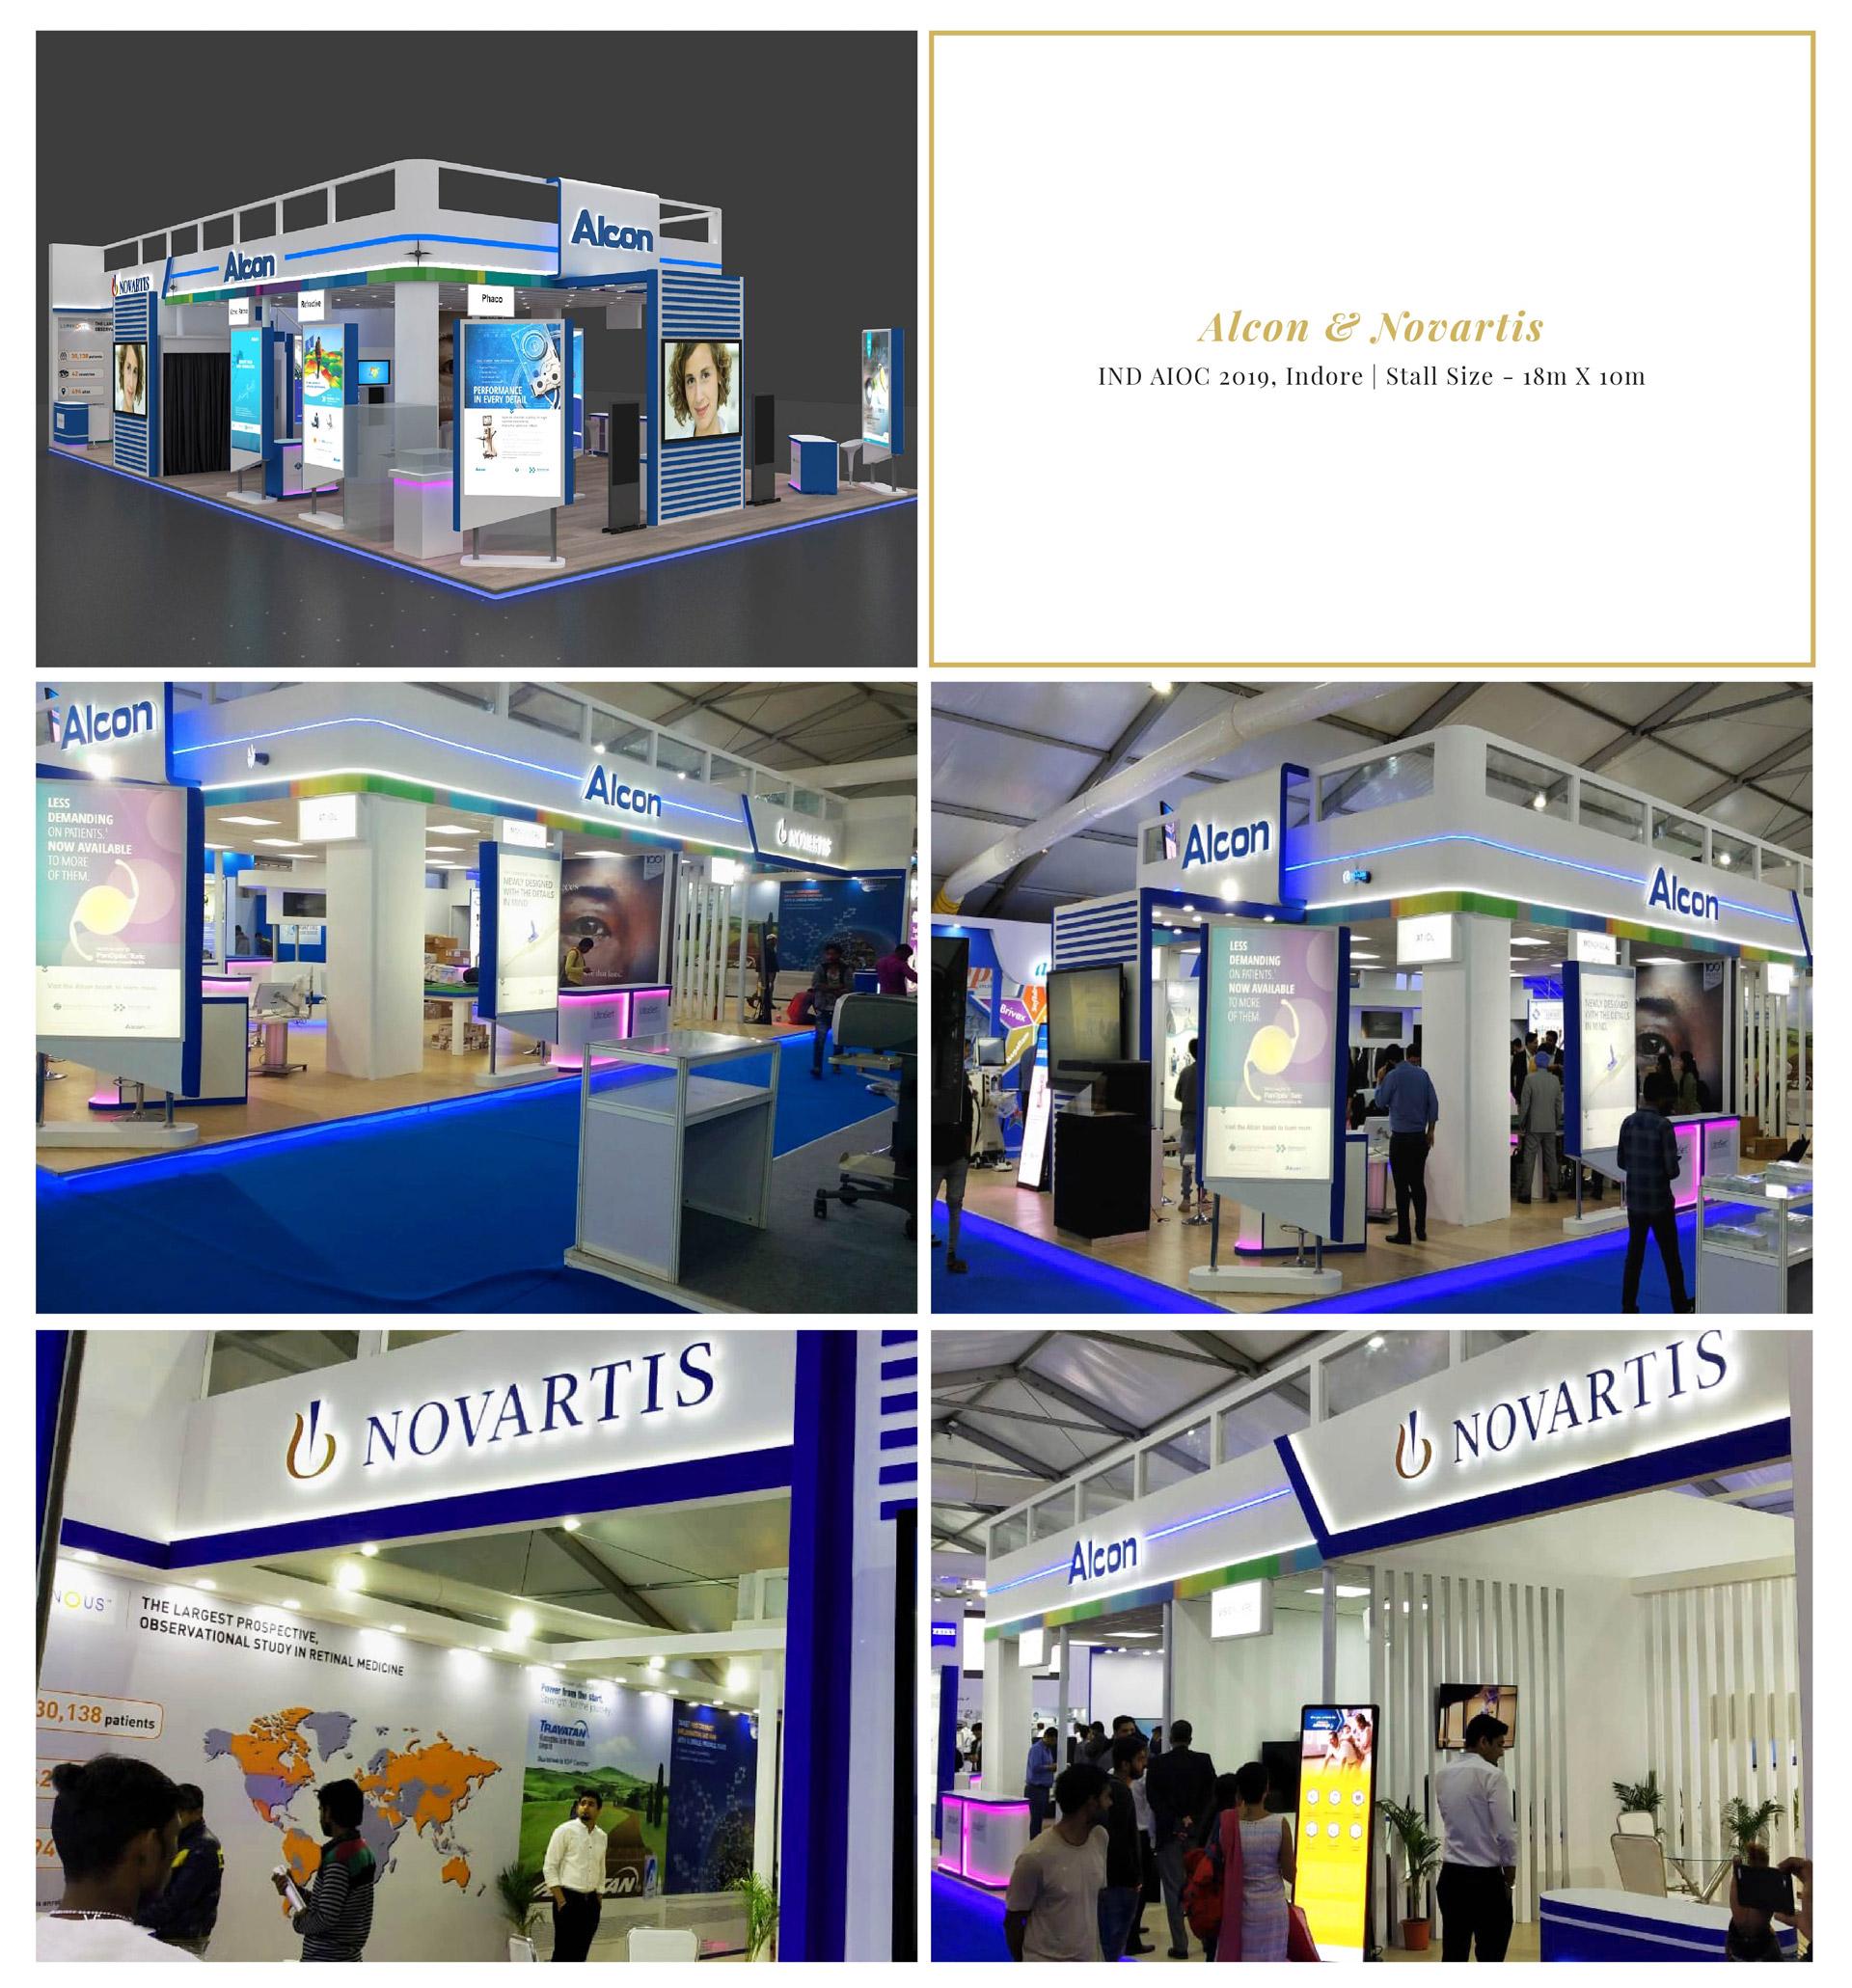 Alcon & Novartis - IND AIOC 2019, Indore